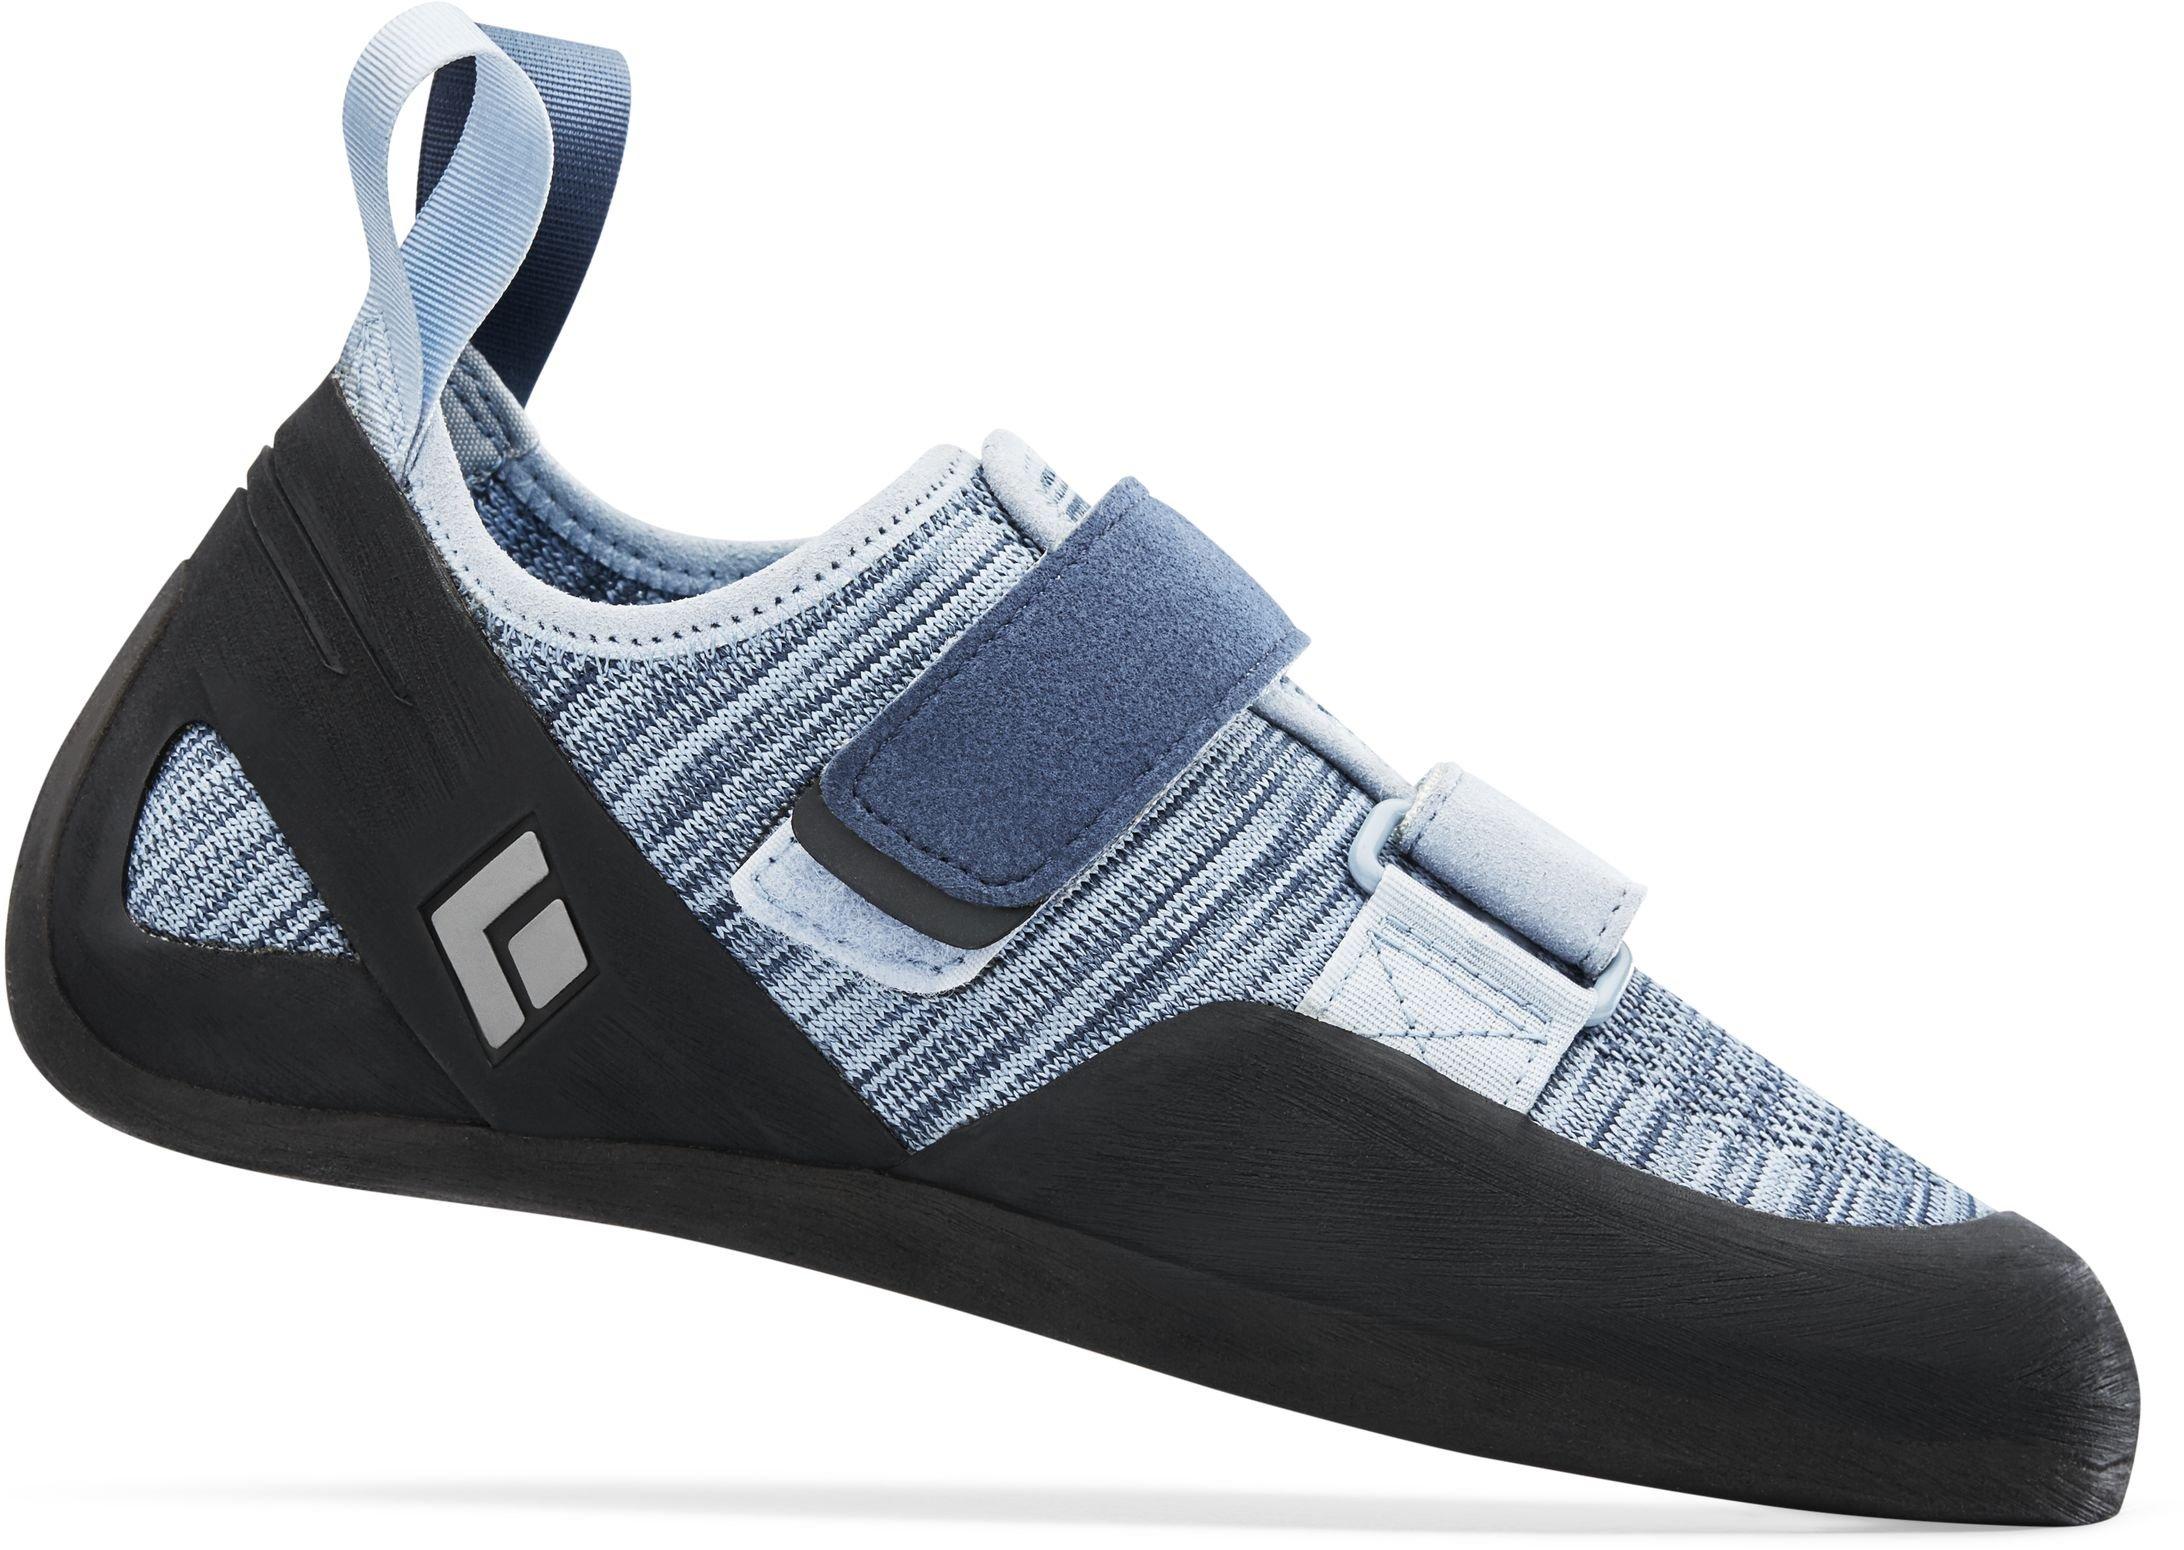 Black Diamond Momentum Climbing Shoe - Women's Blue Steel 8.5